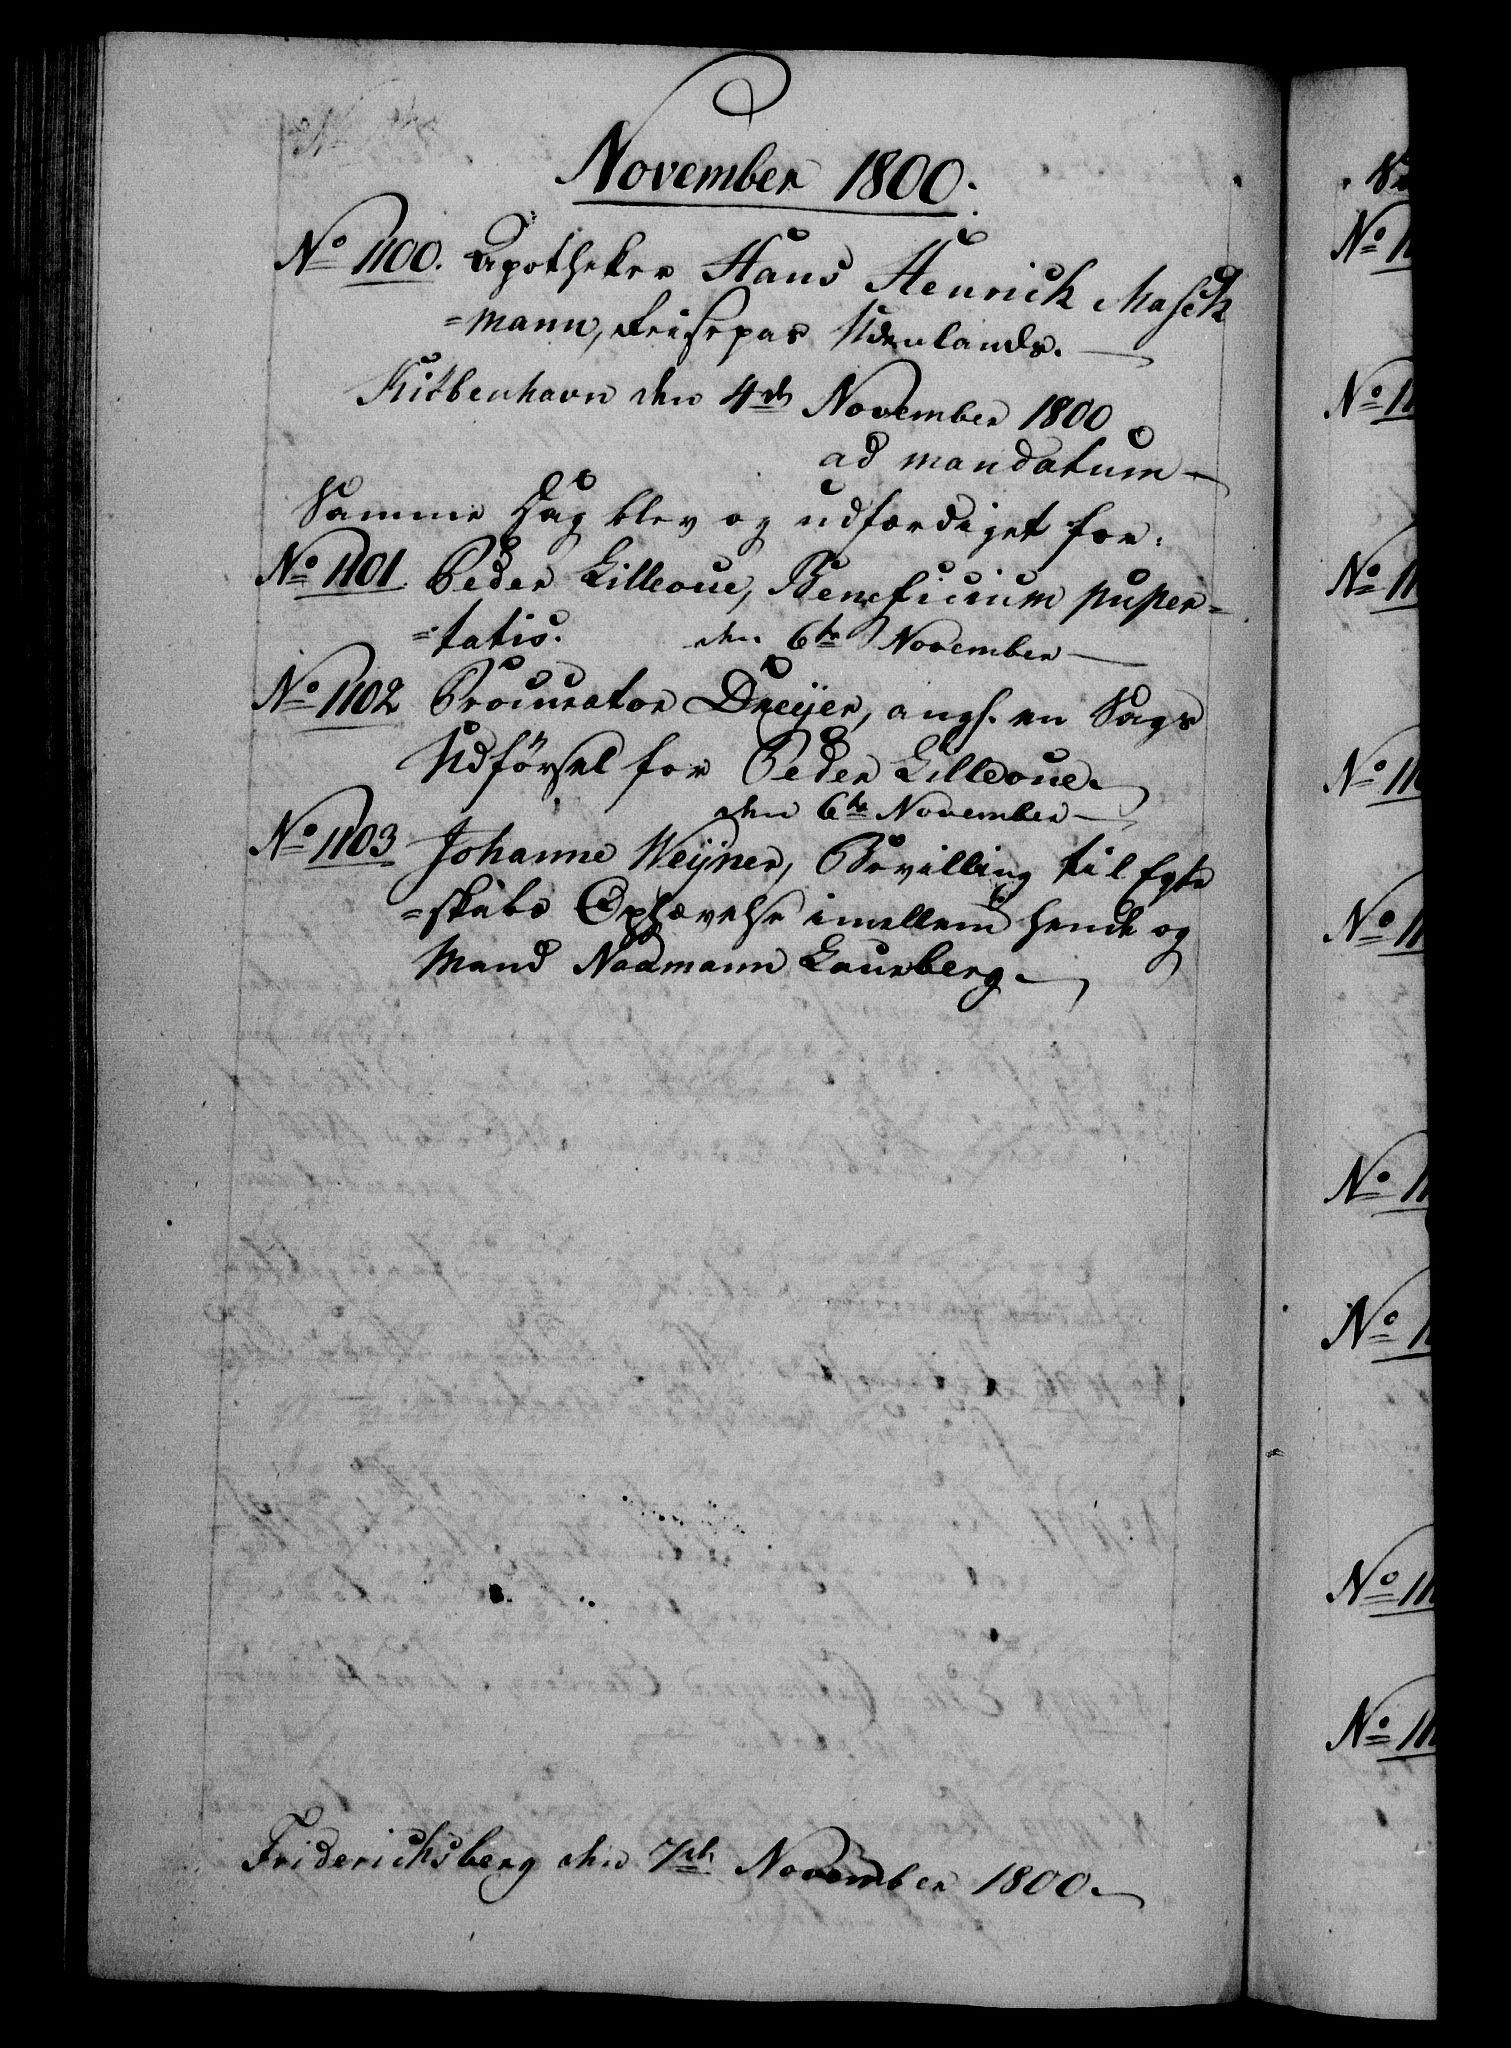 RA, Danske Kanselli 1800-1814, H/Hf/Hfb/Hfba/L0001: Registranter, 1800-1801, s. 324b